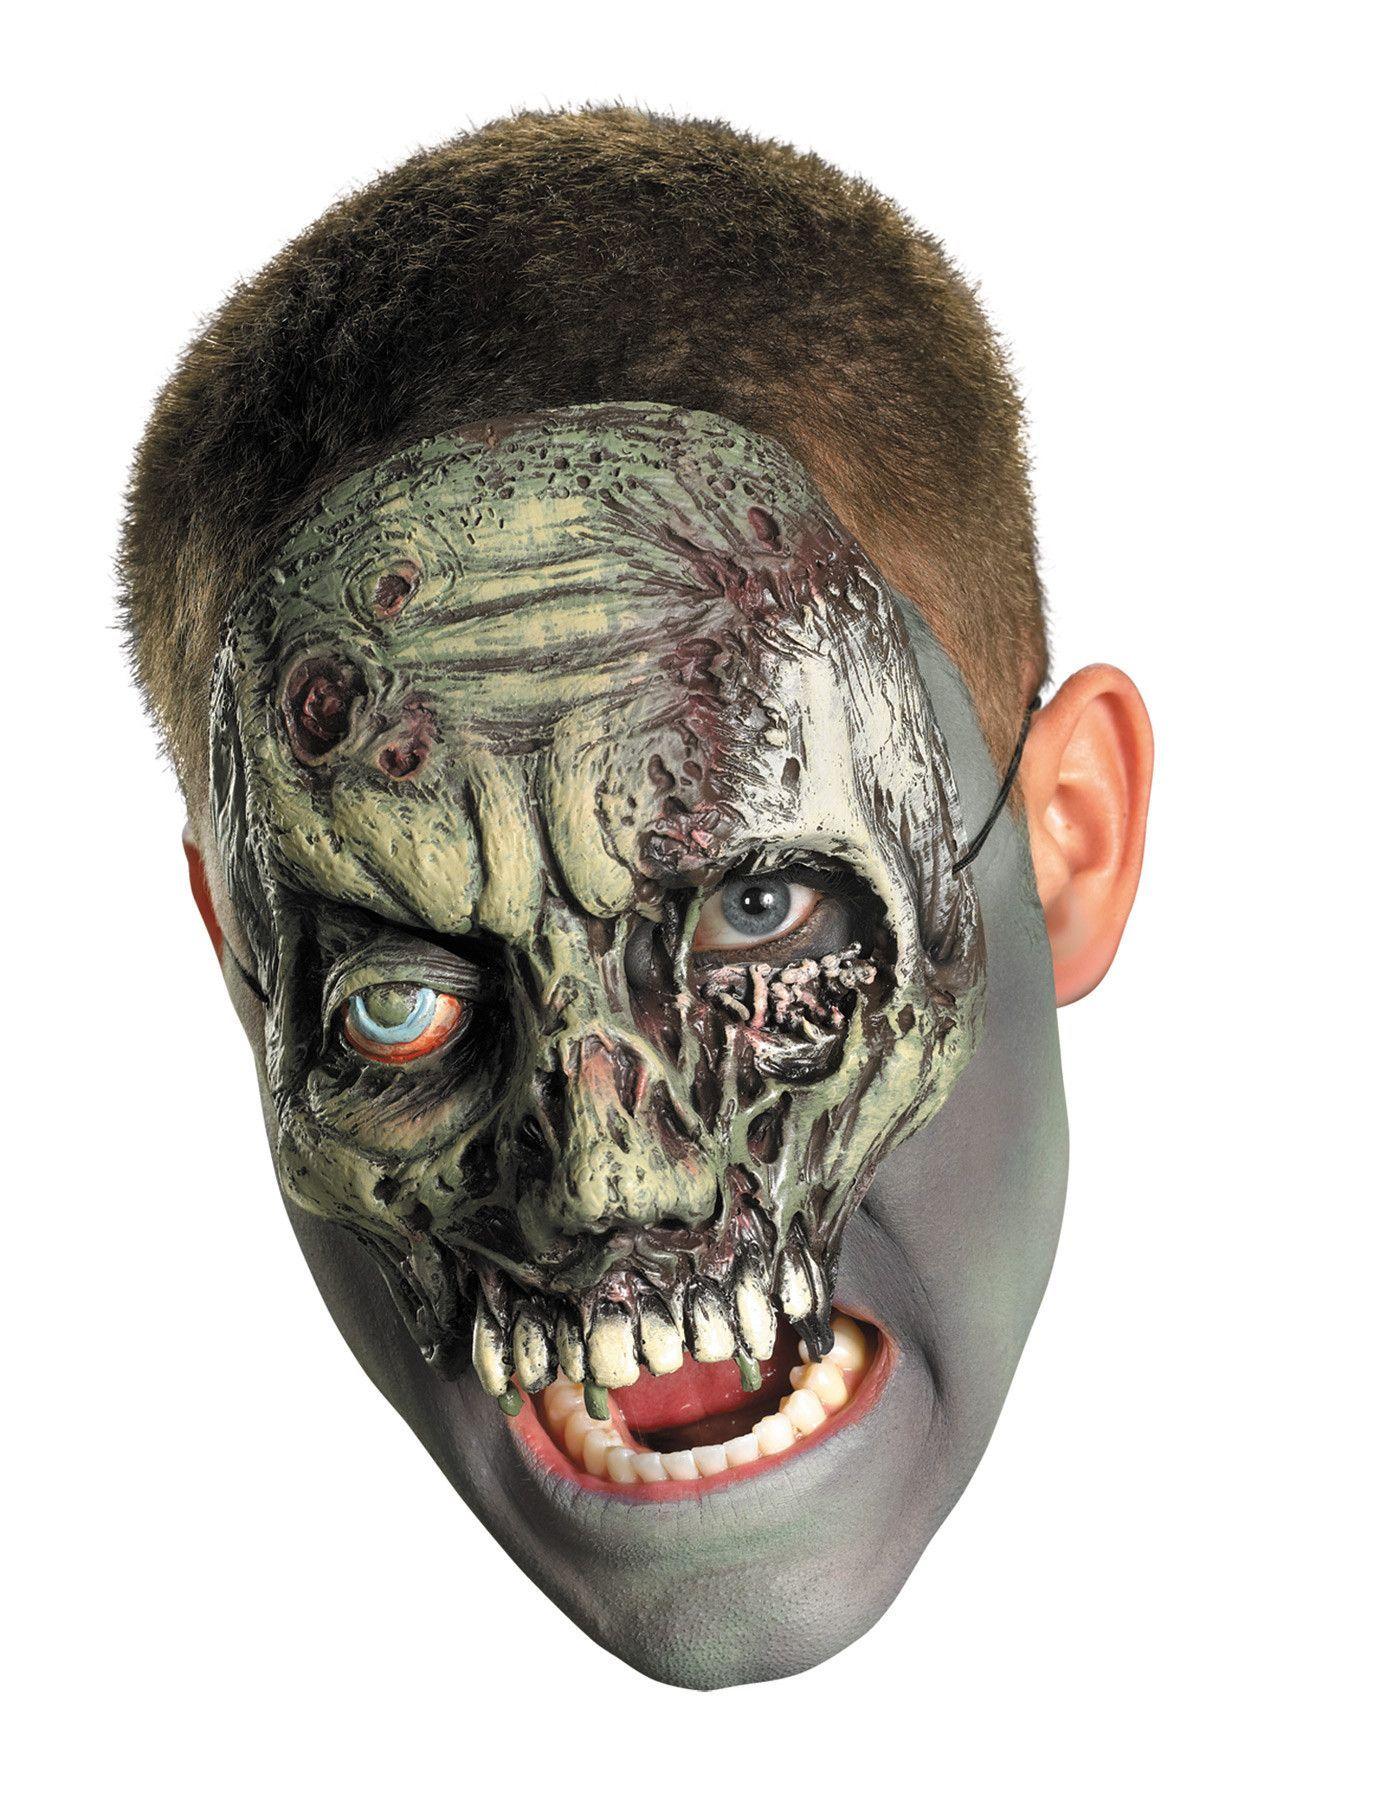 Dead Skin Adult Vinyl Chinless Costume Mask